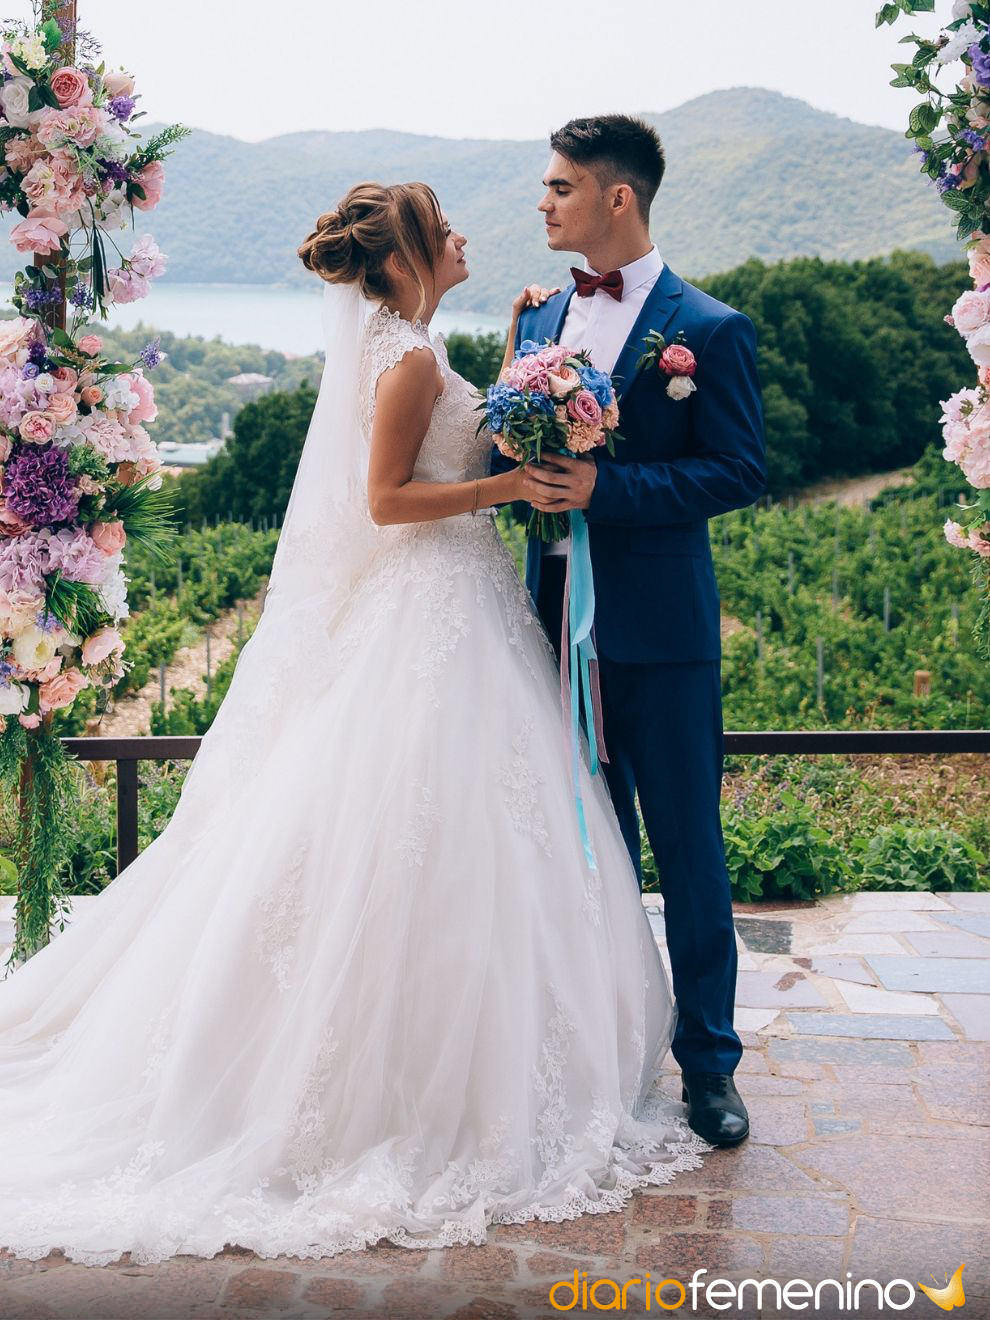 114 frases bonitas para una boda: palabras de amor para novios e invitados